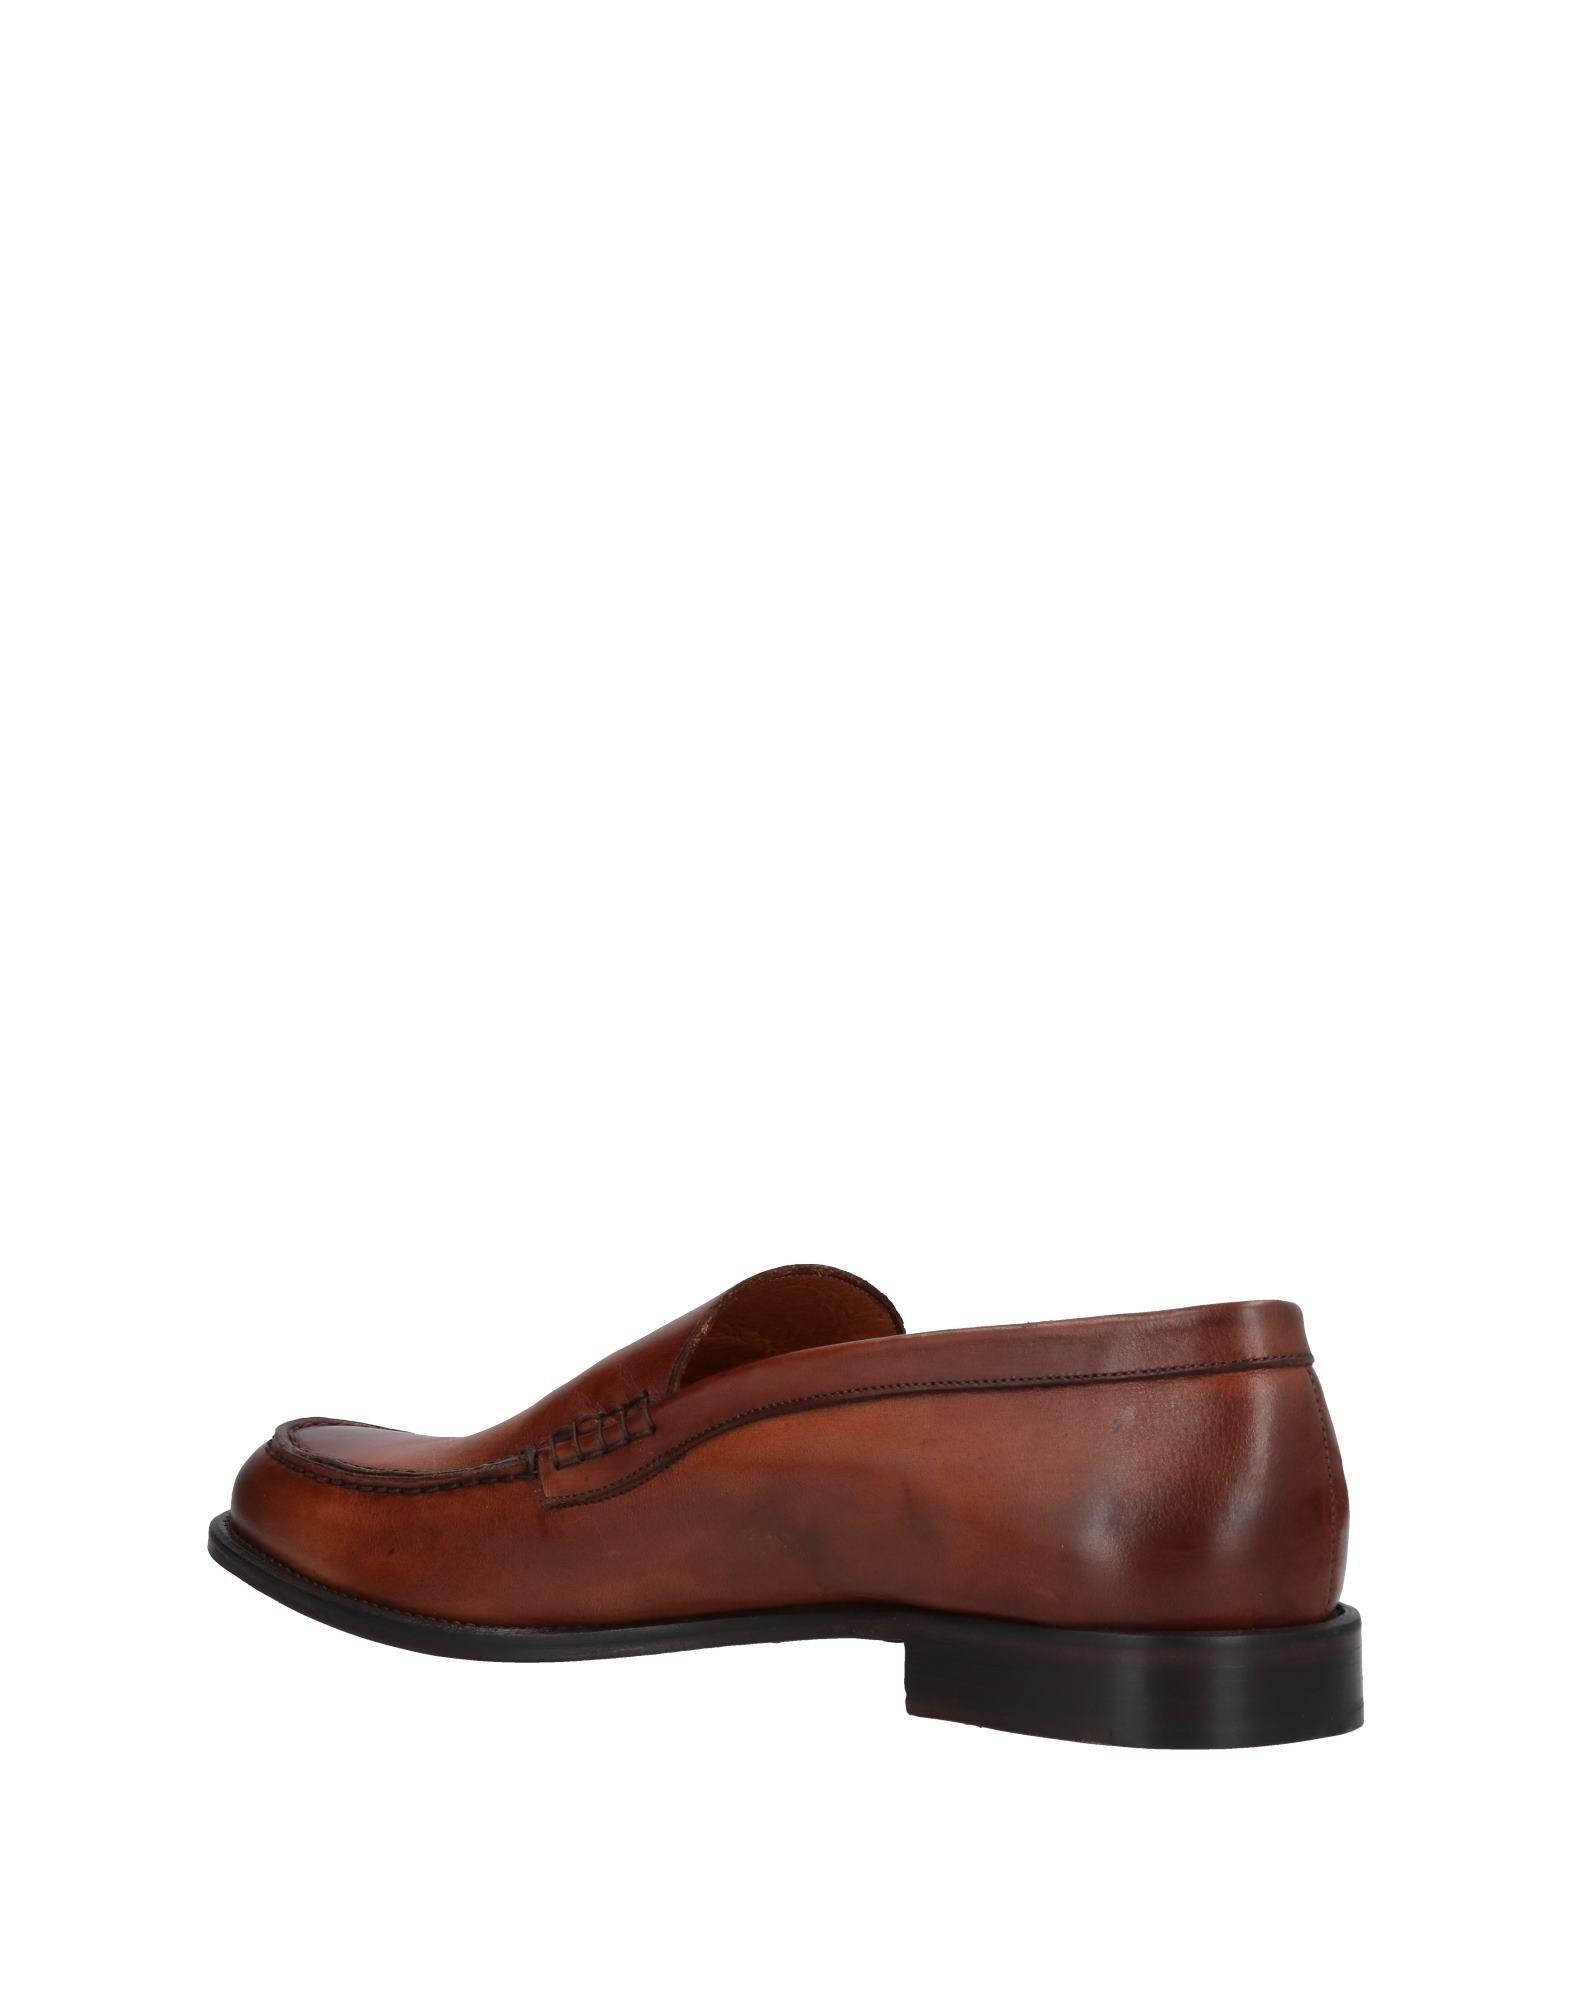 Rabatt echte Schuhe 11411621LV Brawn's Mokassins Herren  11411621LV Schuhe c74a17